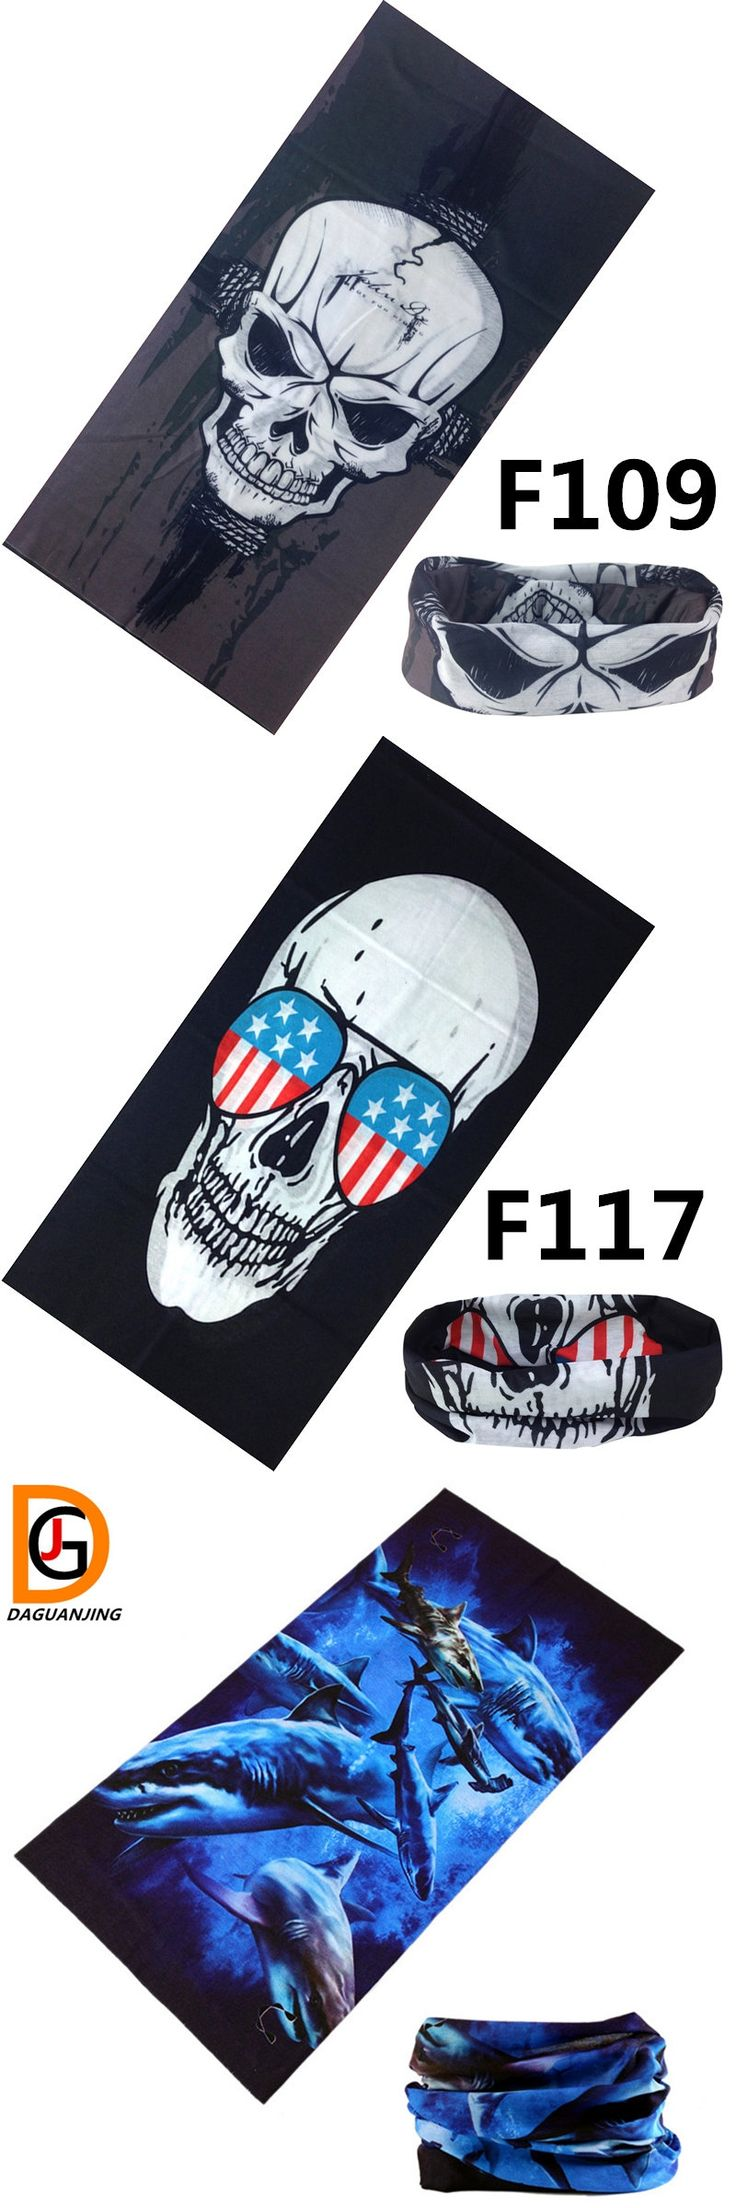 Skull Bandana Bike Motorcycle Helmet Neck Face Mask Ring Scarf Paintball  Sport Headband No.F121